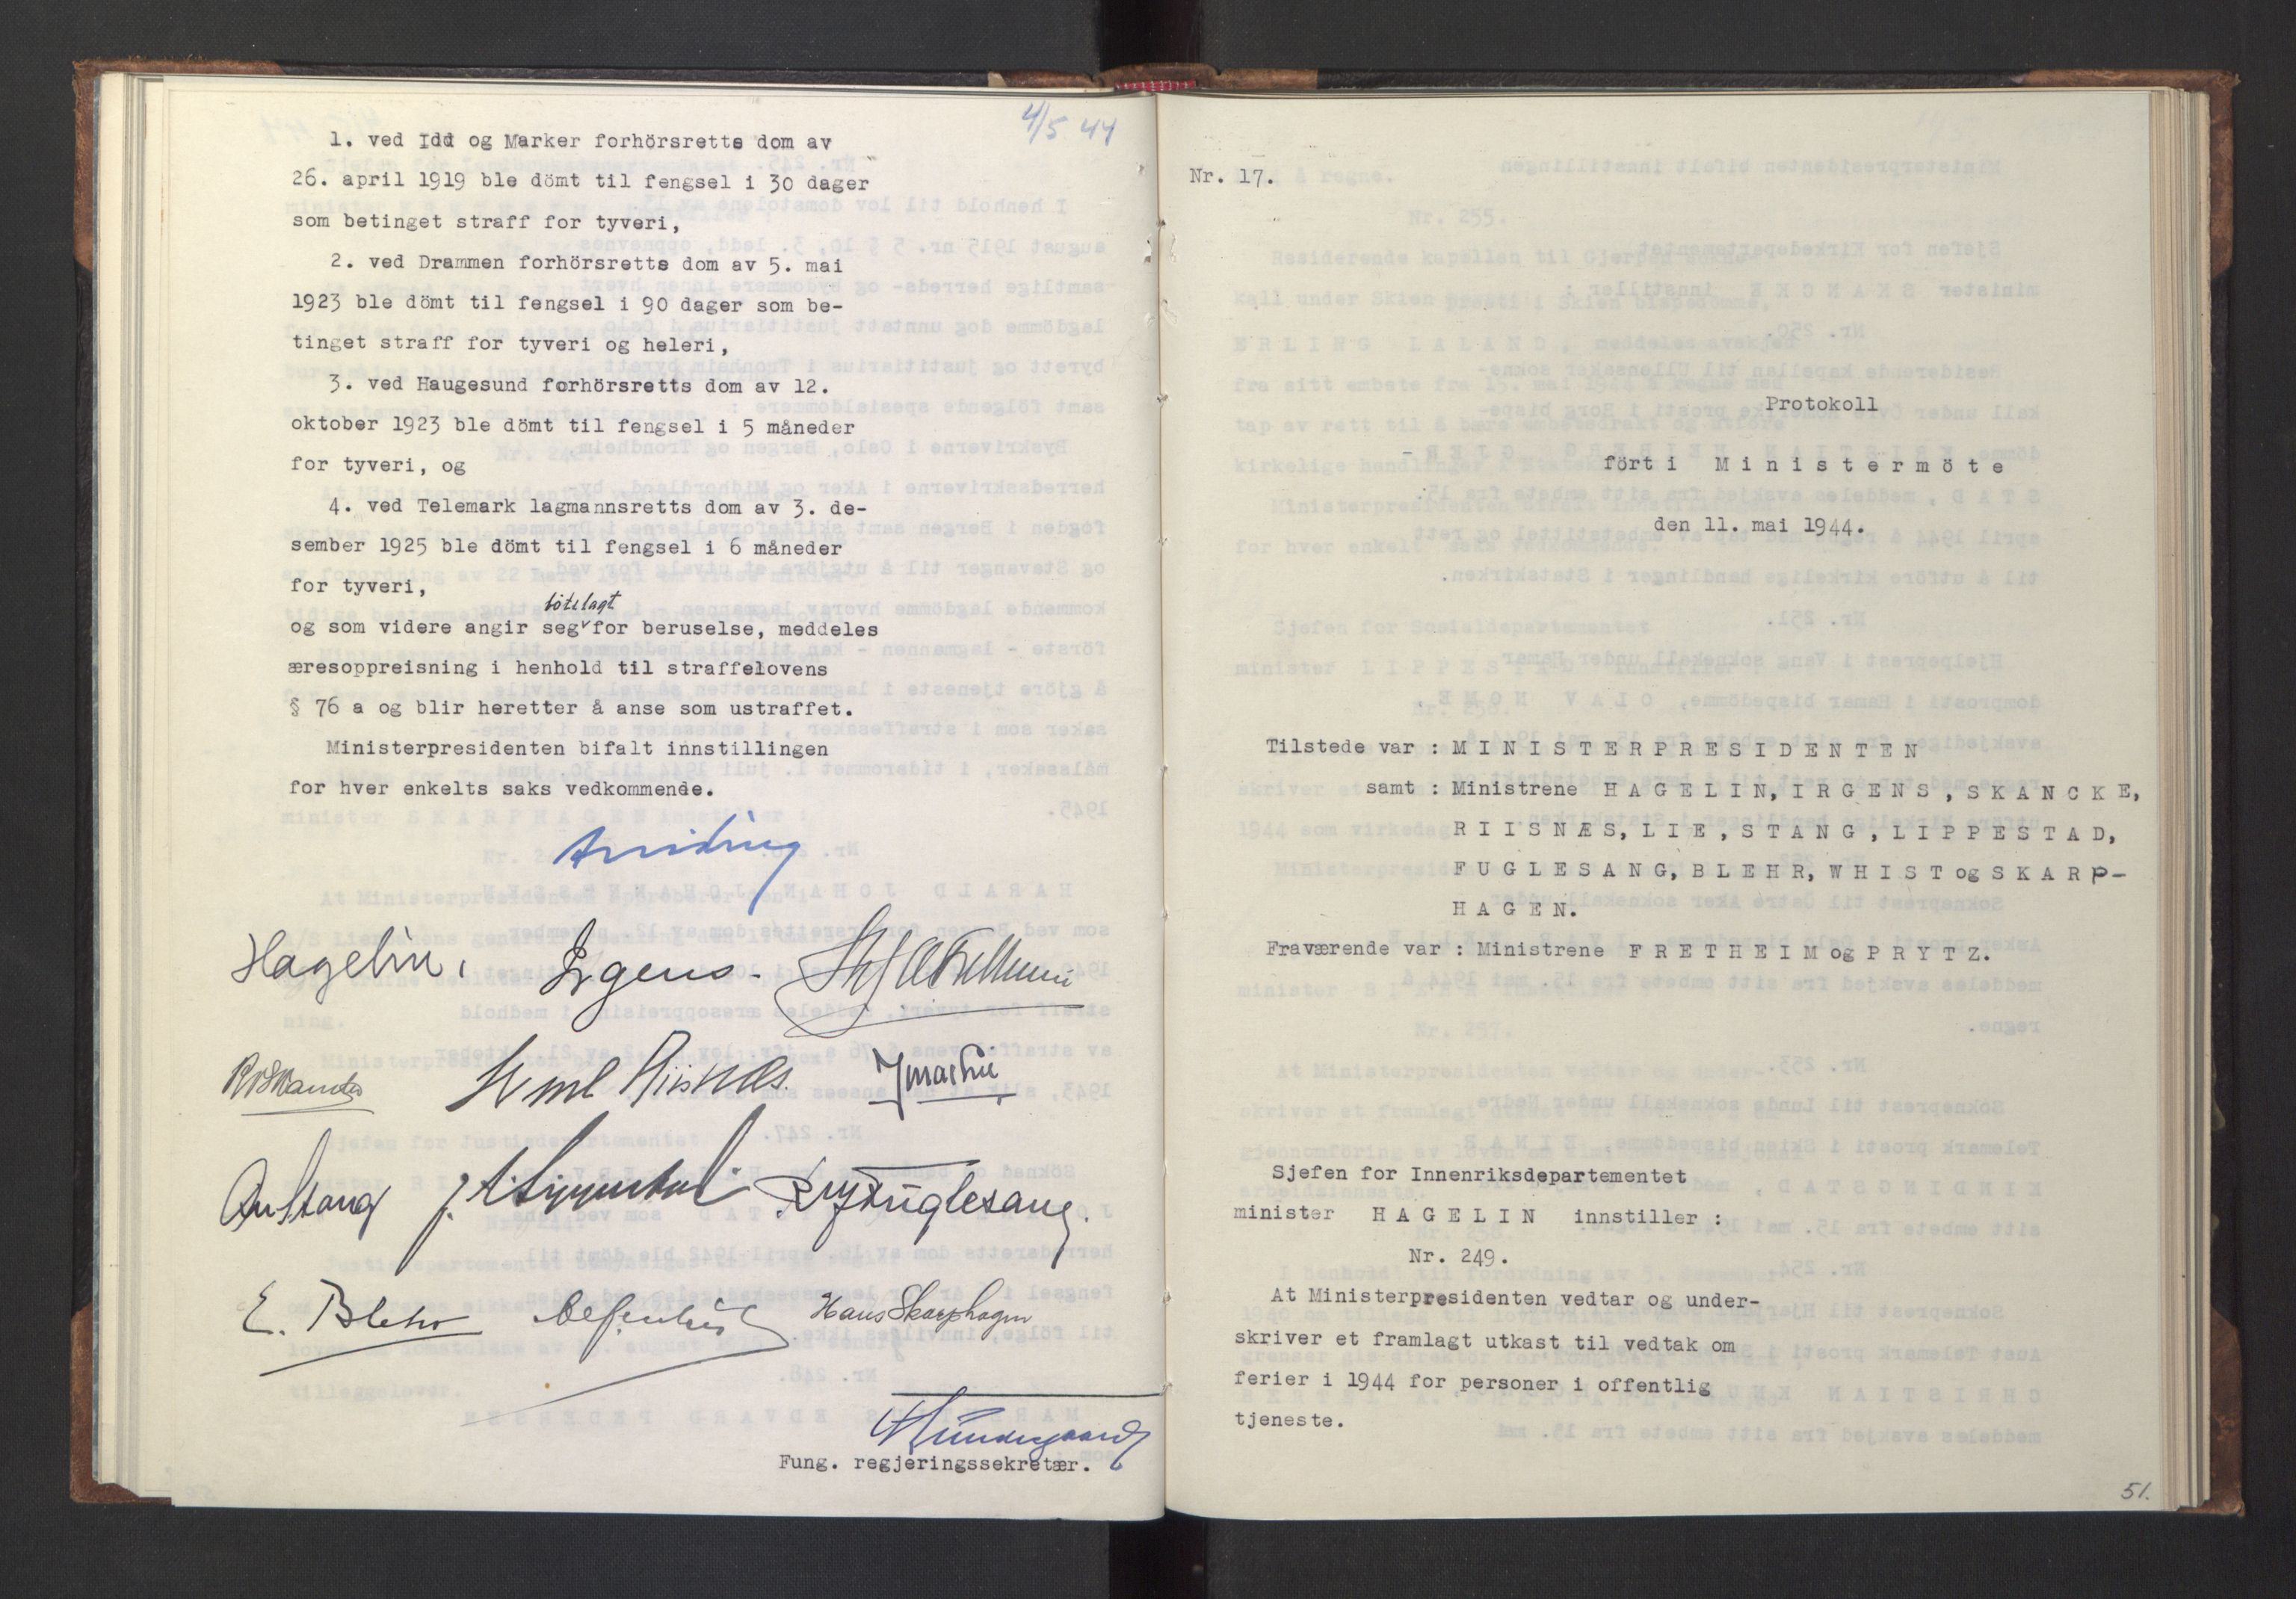 RA, NS-administrasjonen 1940-1945 (Statsrådsekretariatet, de kommisariske statsråder mm), D/Da/L0005: Protokoll fra ministermøter, 1944, s. 50b-51a